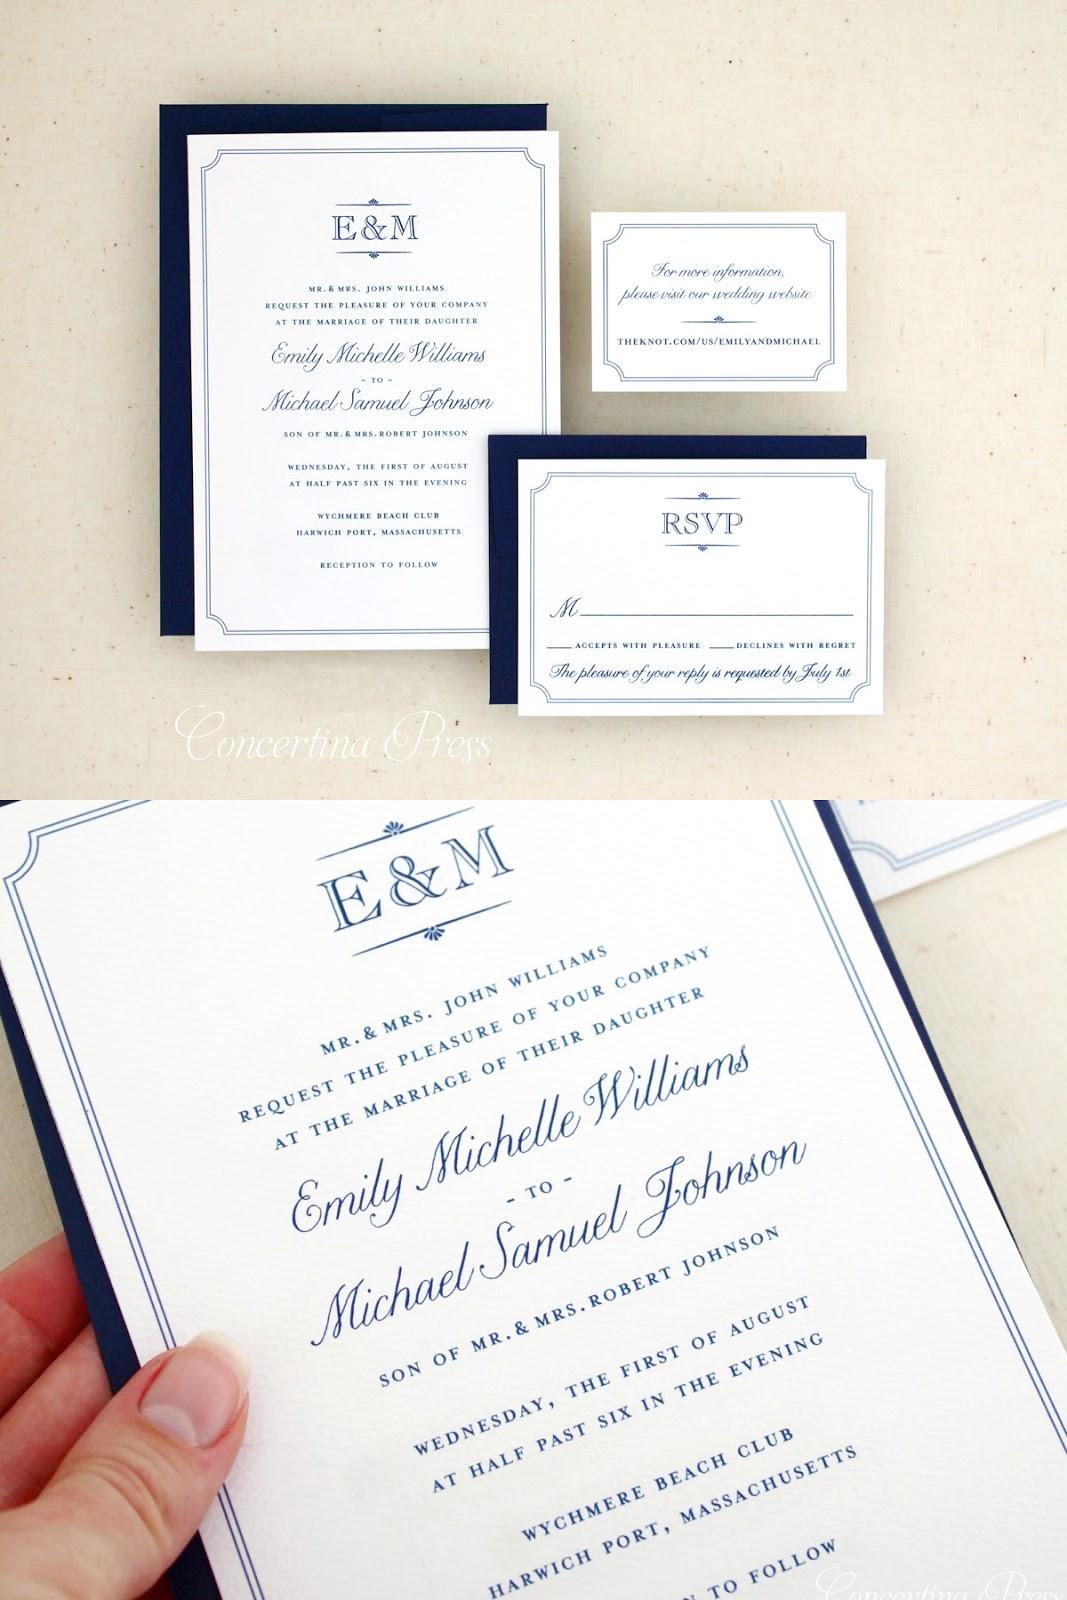 Elegant Monogram Invitation for a Wychmere Beach Club Wedding from Concertina Press